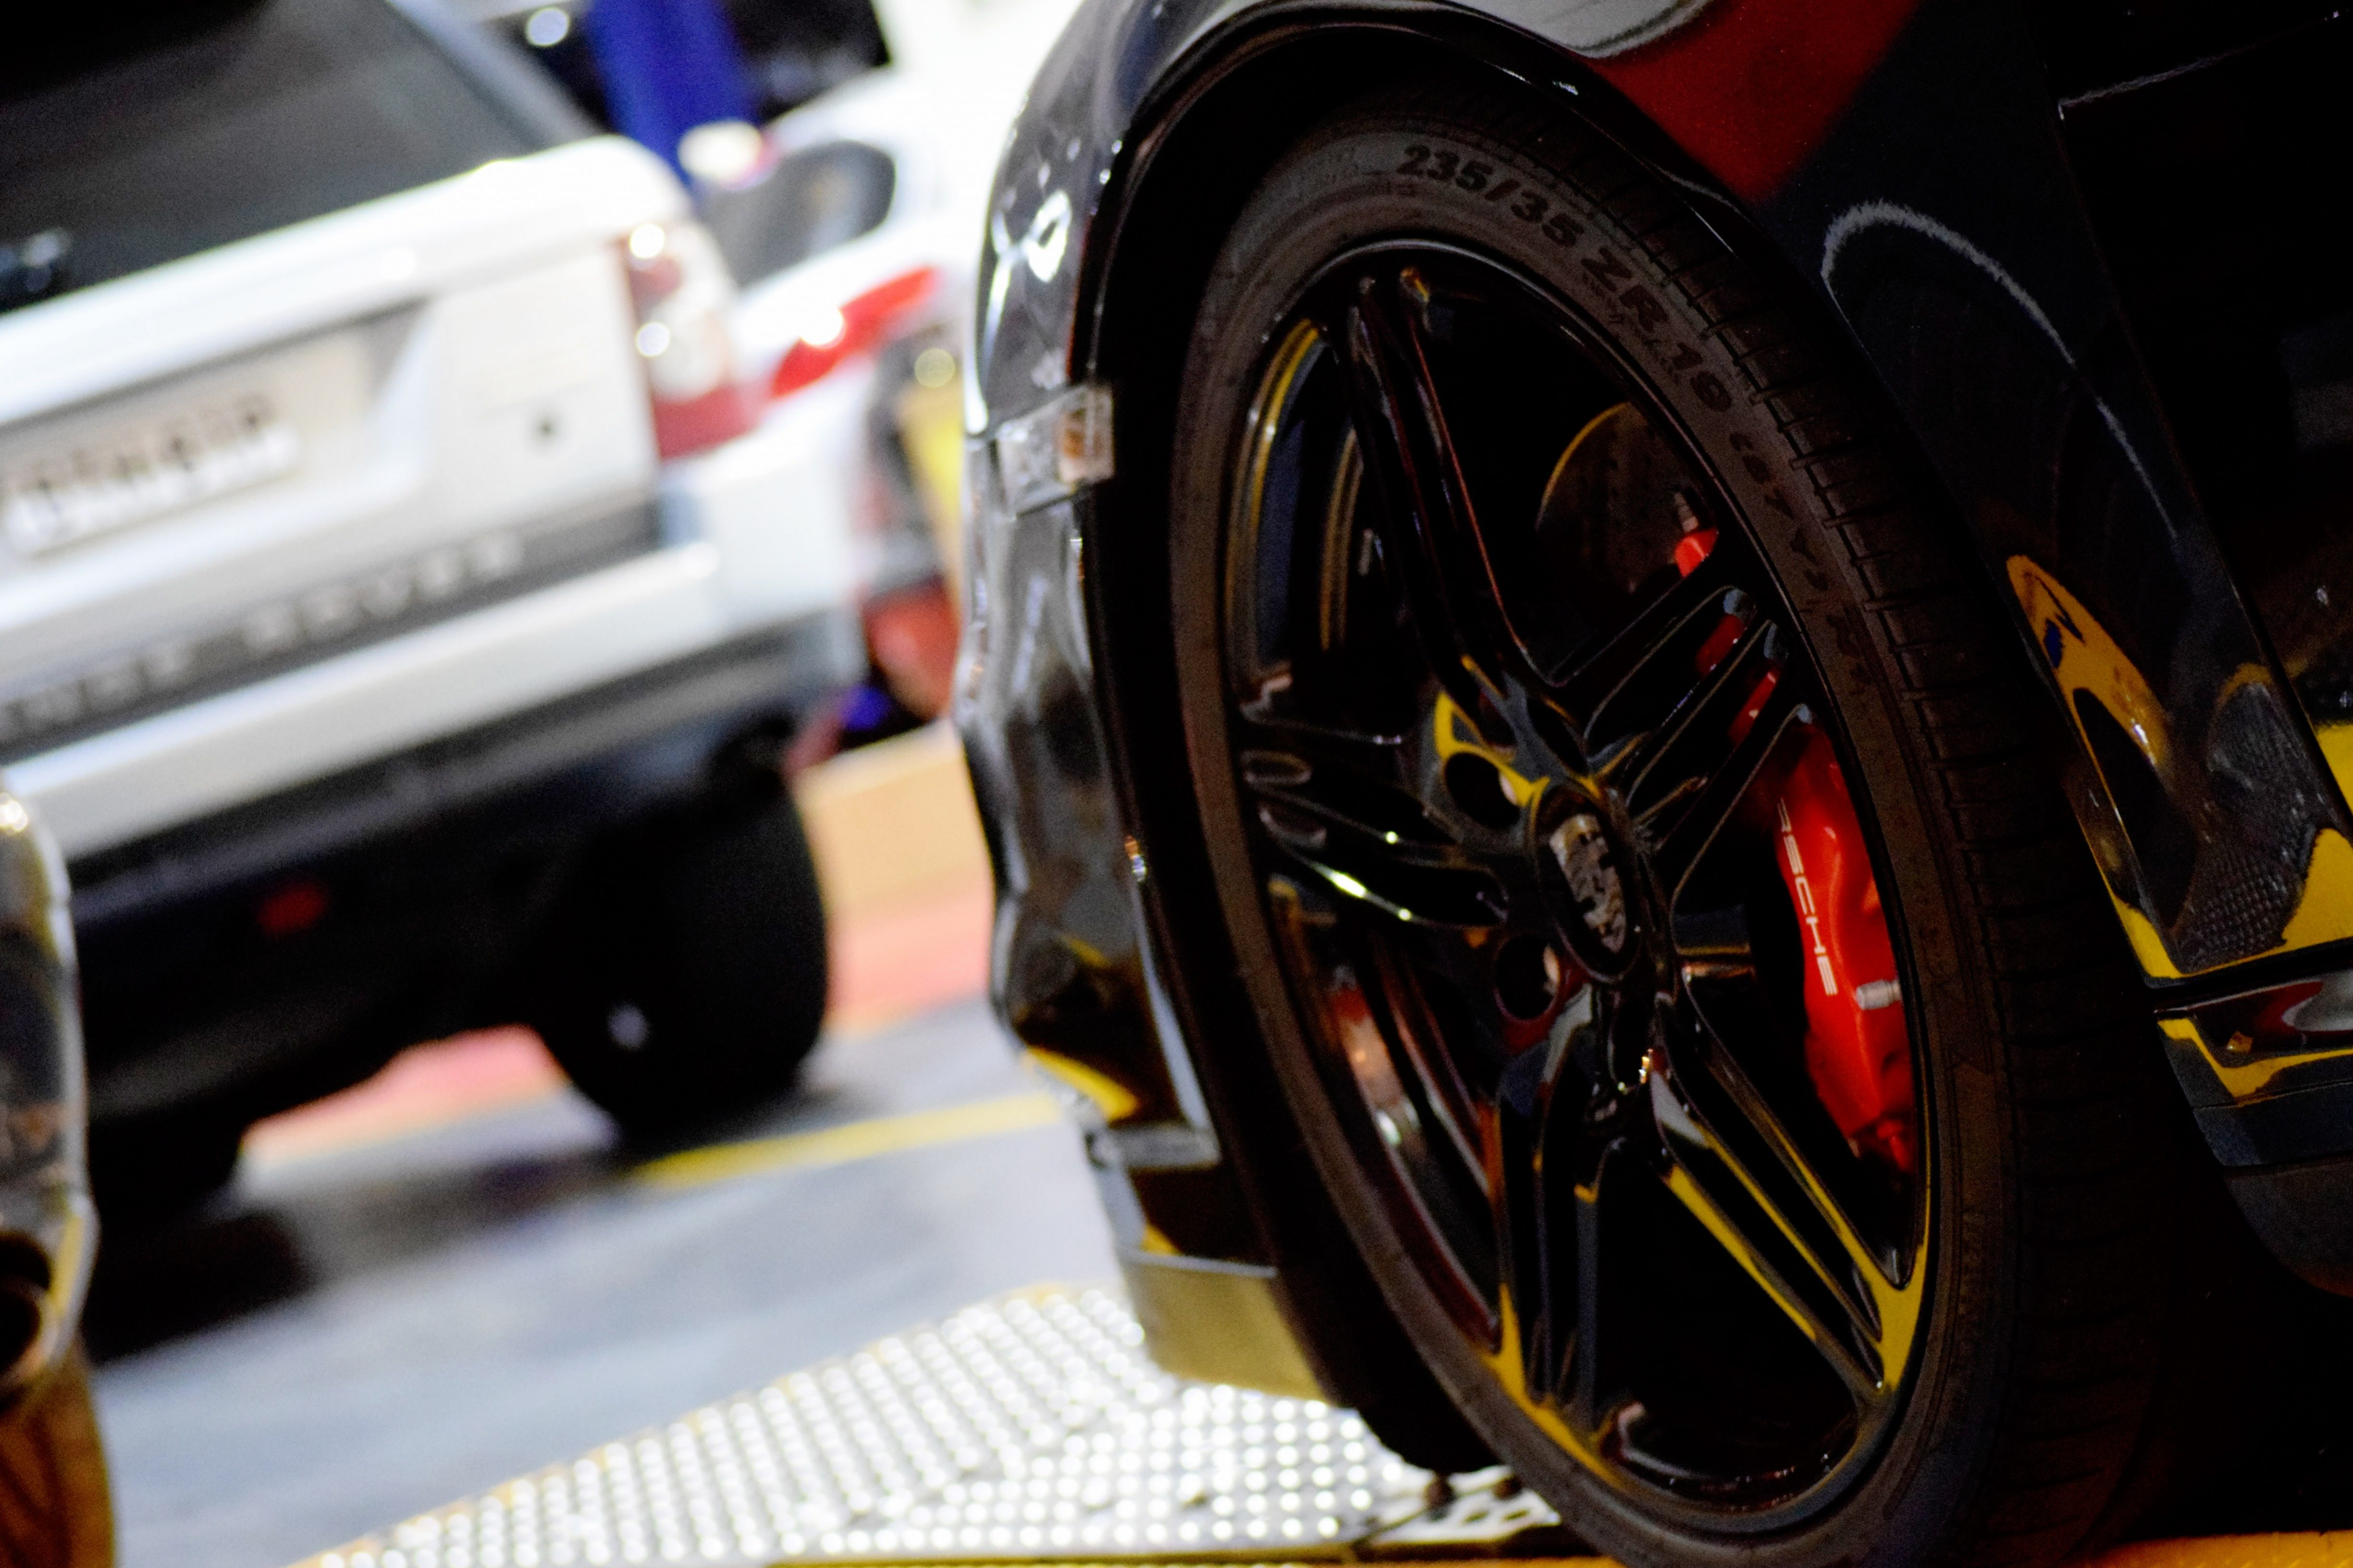 Wheel Alignment & Wheel Balancing - Hitech Auto Mechanical